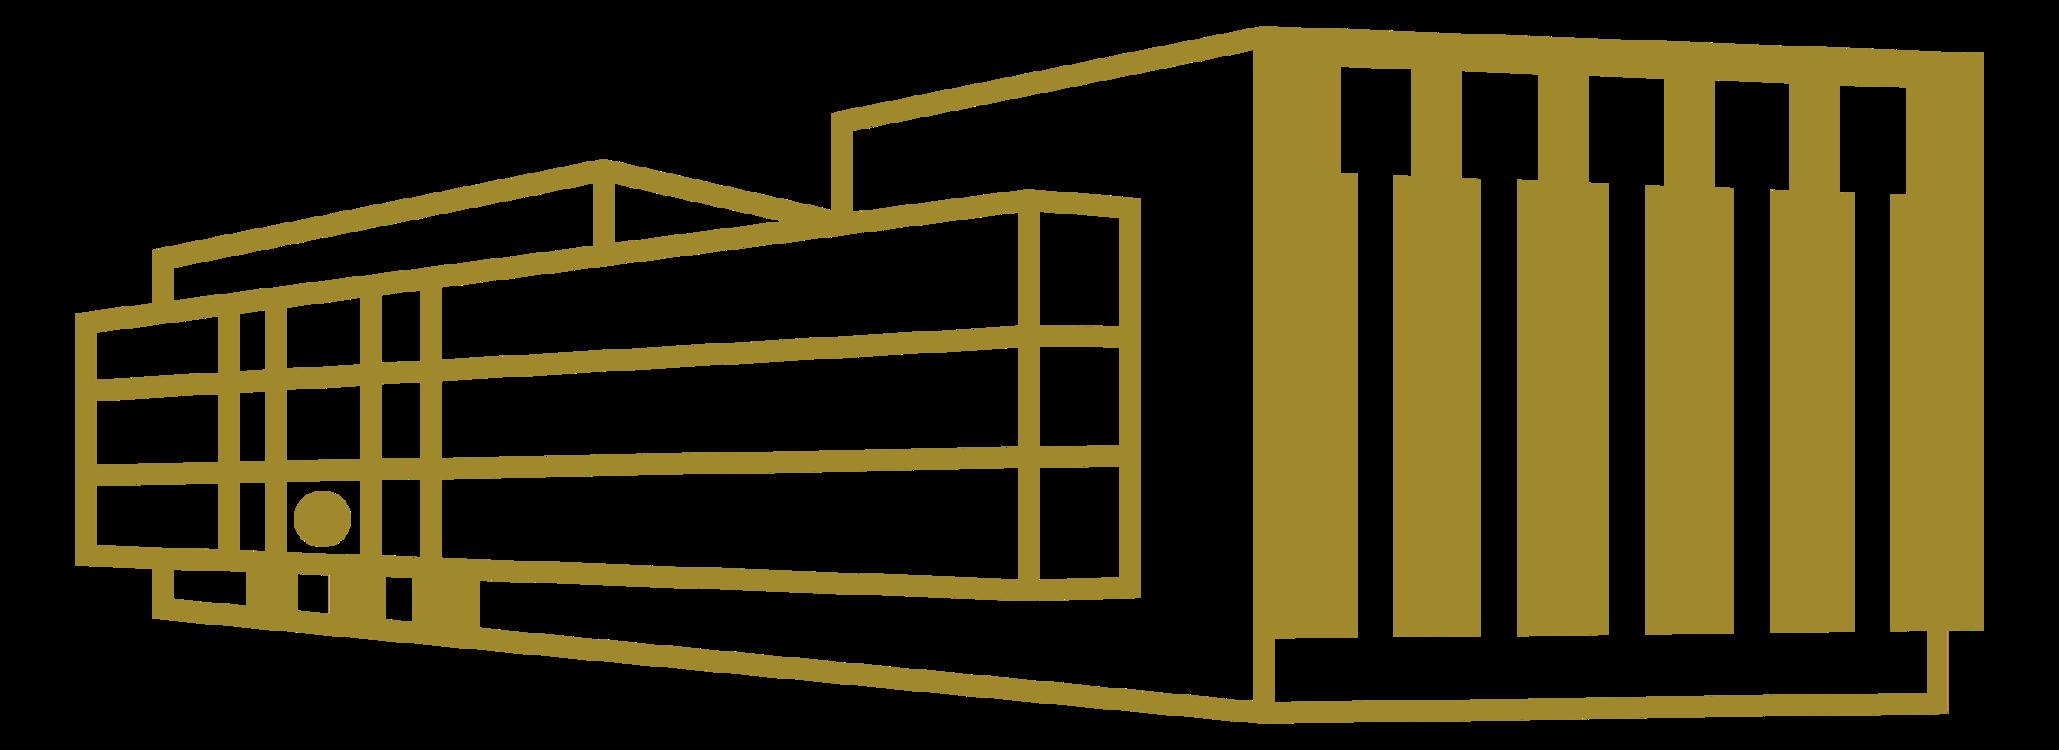 Line,Parallel,Furniture